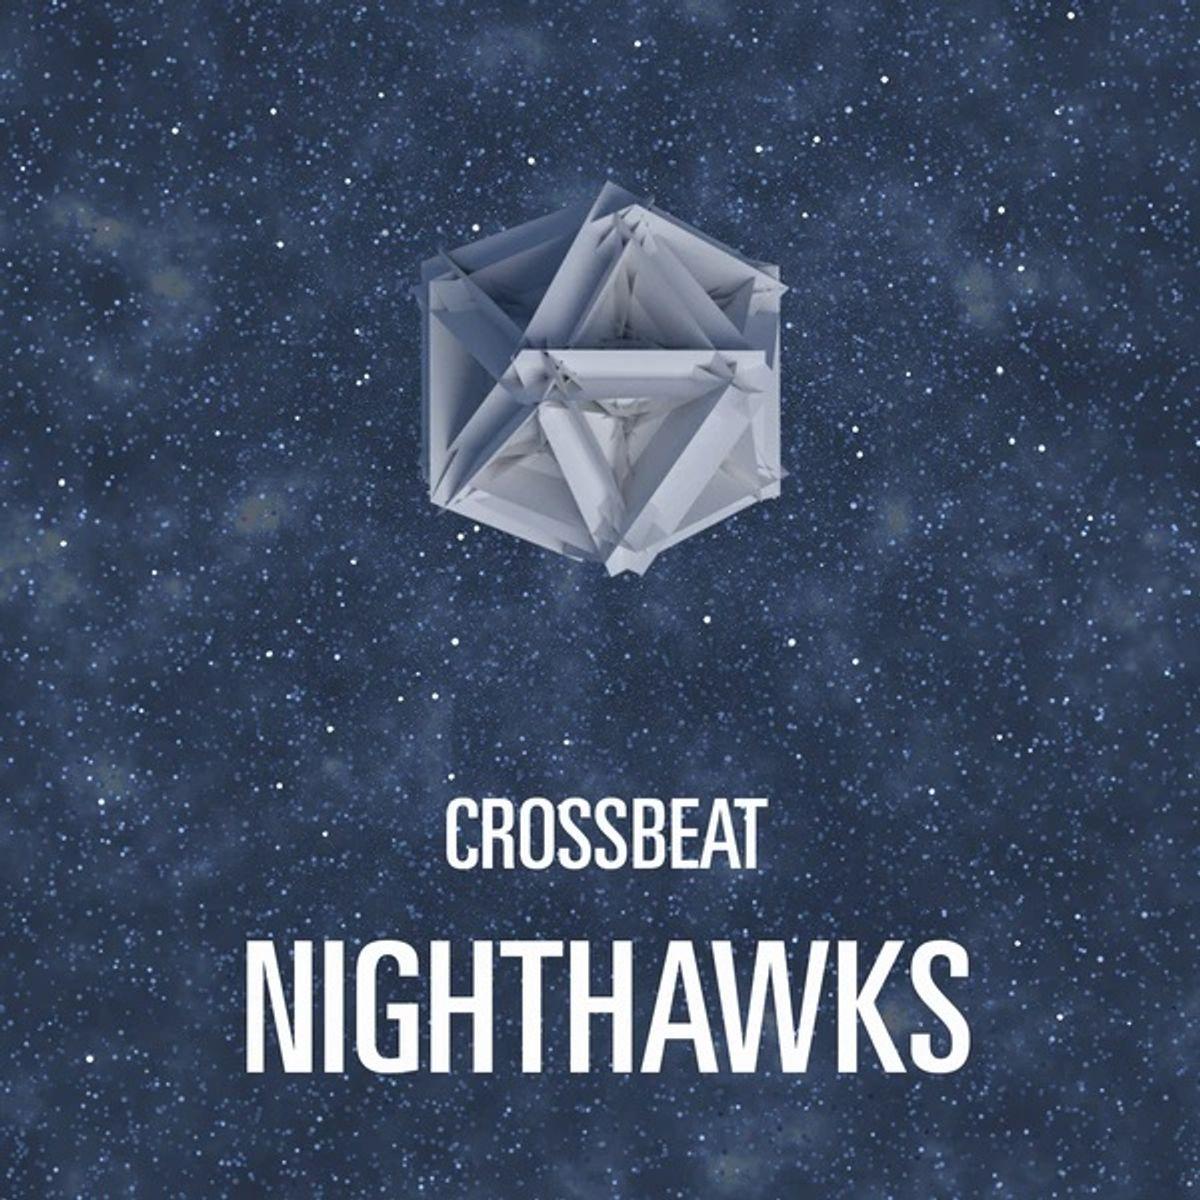 Crossbeat - Nighthawks